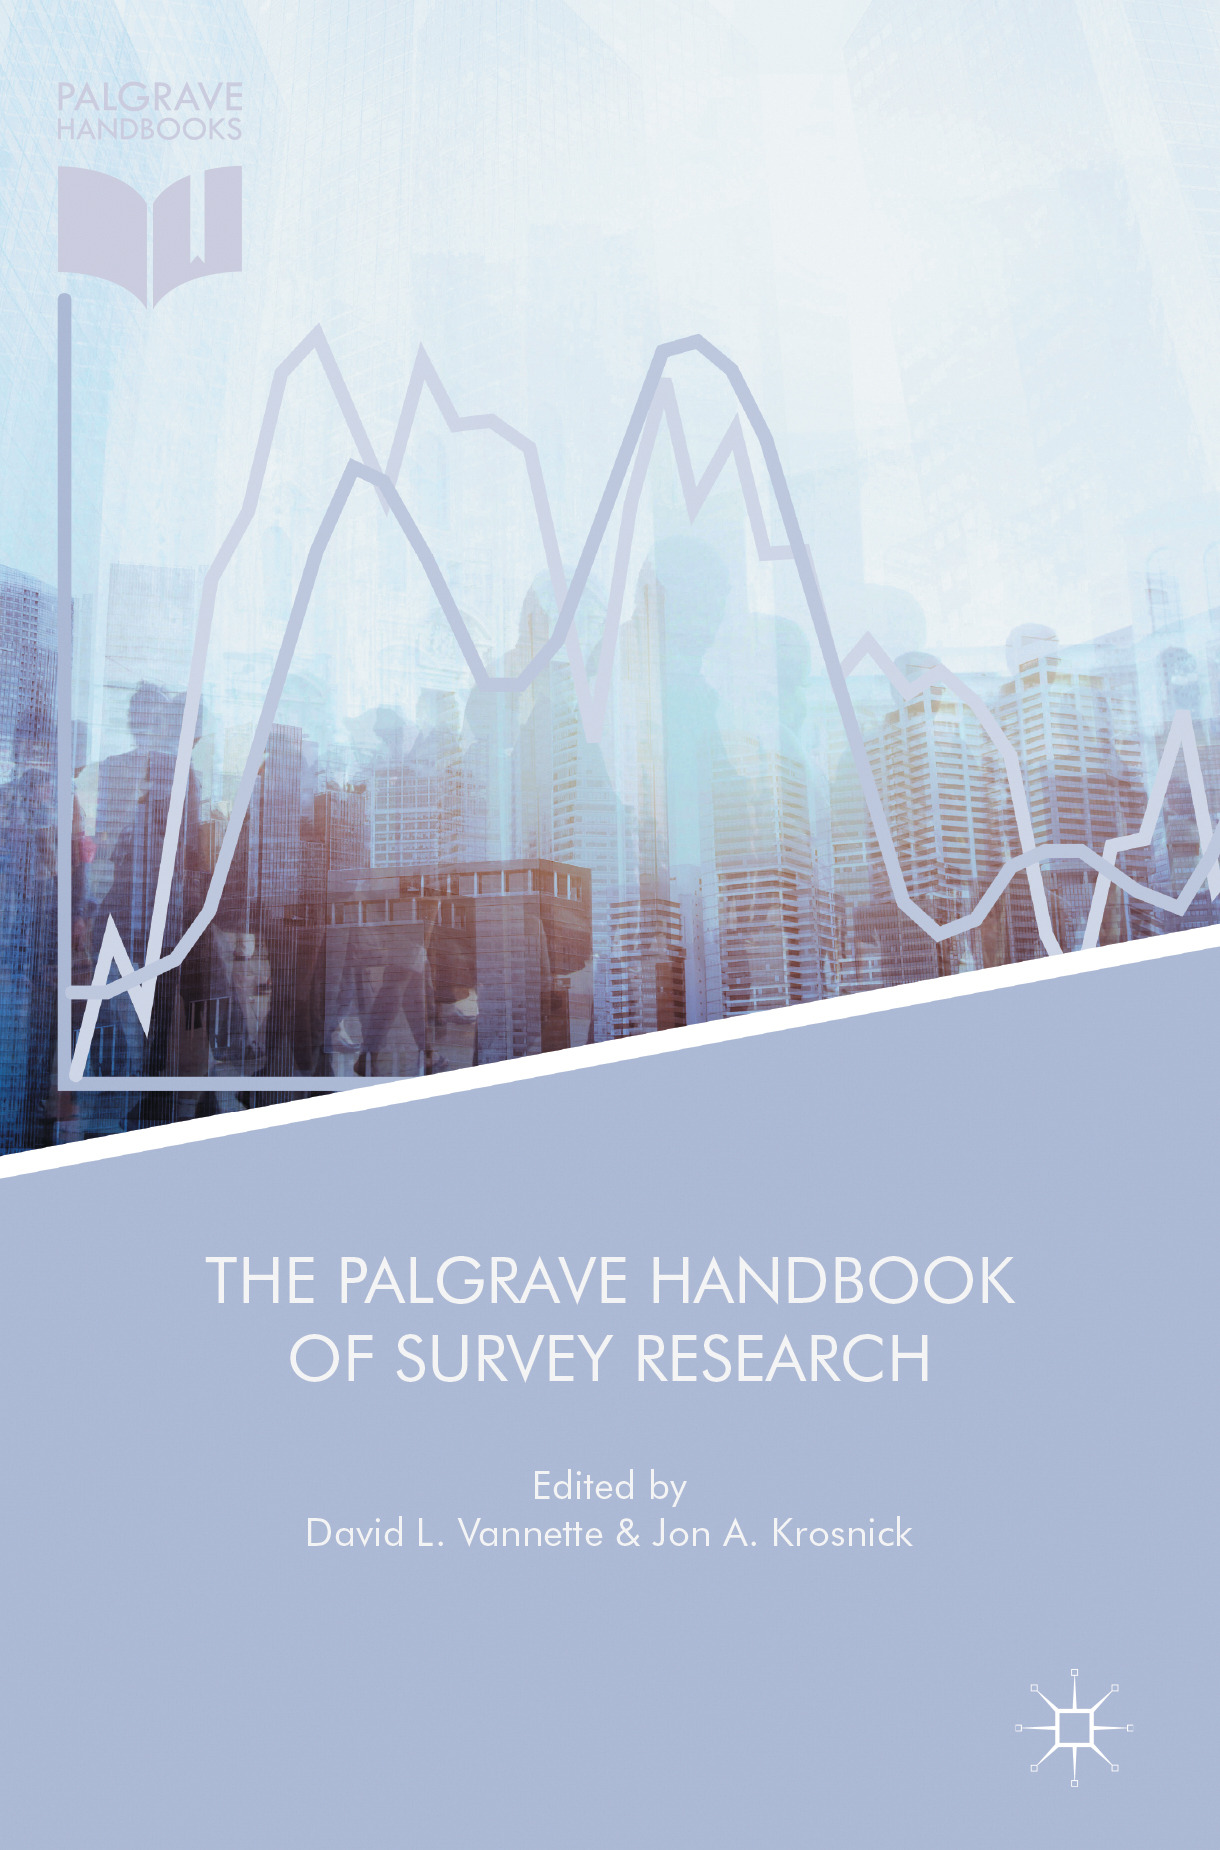 Krosnick, Jon A. - The Palgrave Handbook of Survey Research, ebook